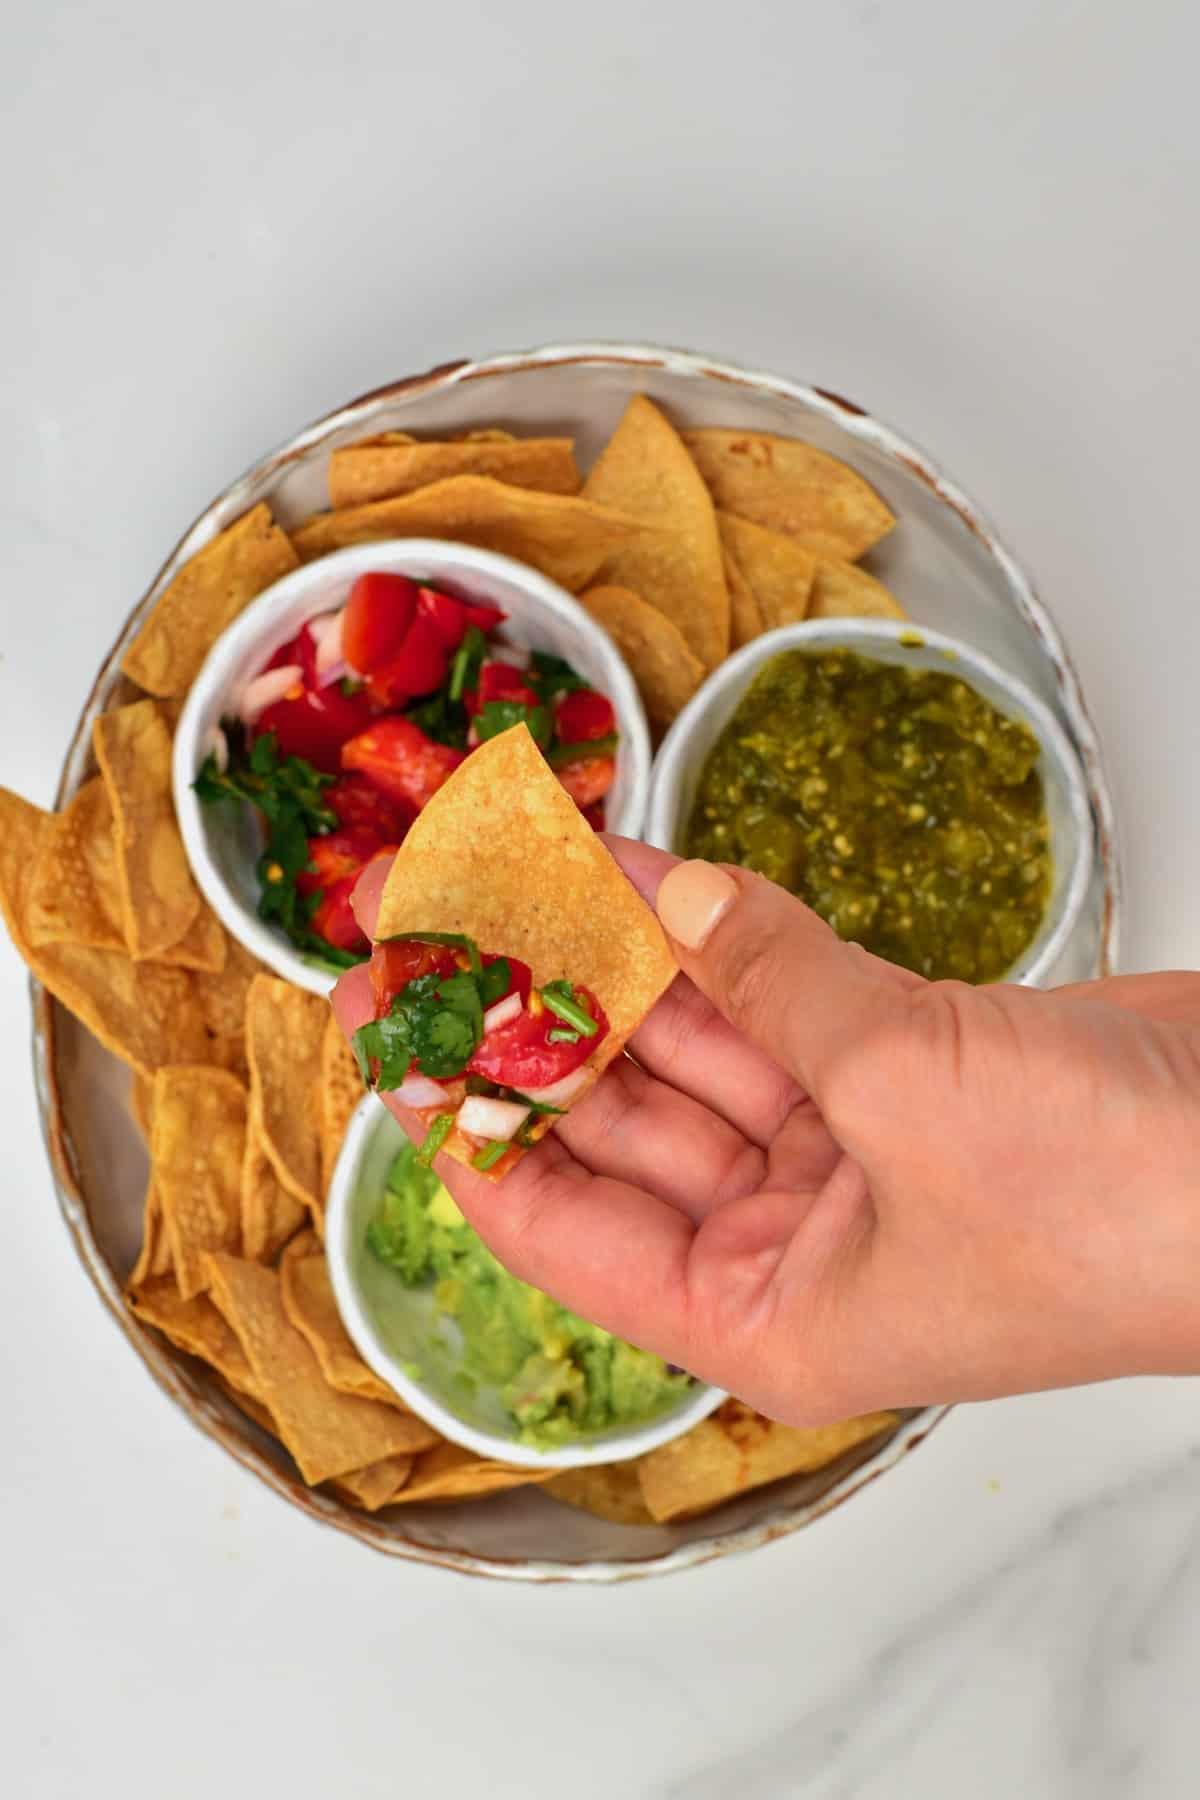 Hand holding tortilla chip with pico de gallo